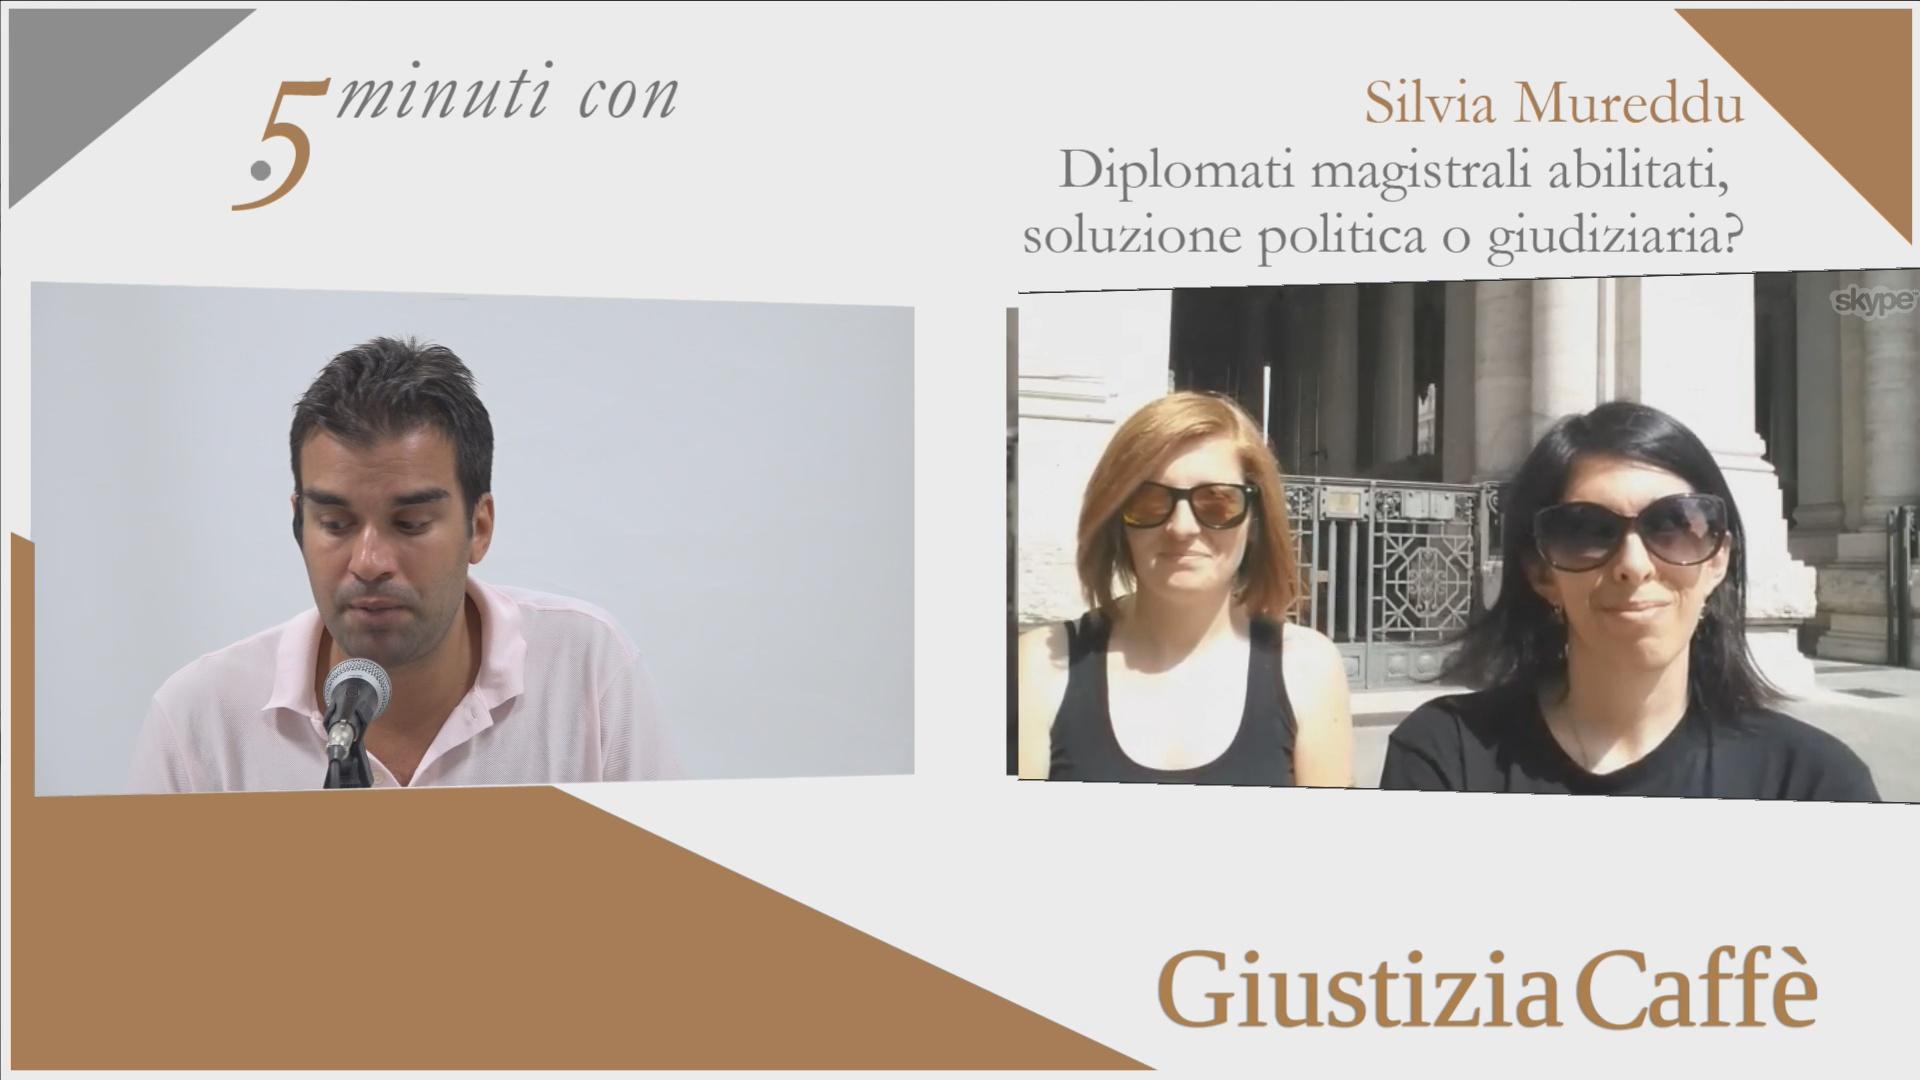 5 minuti con… Silvia Mureddu